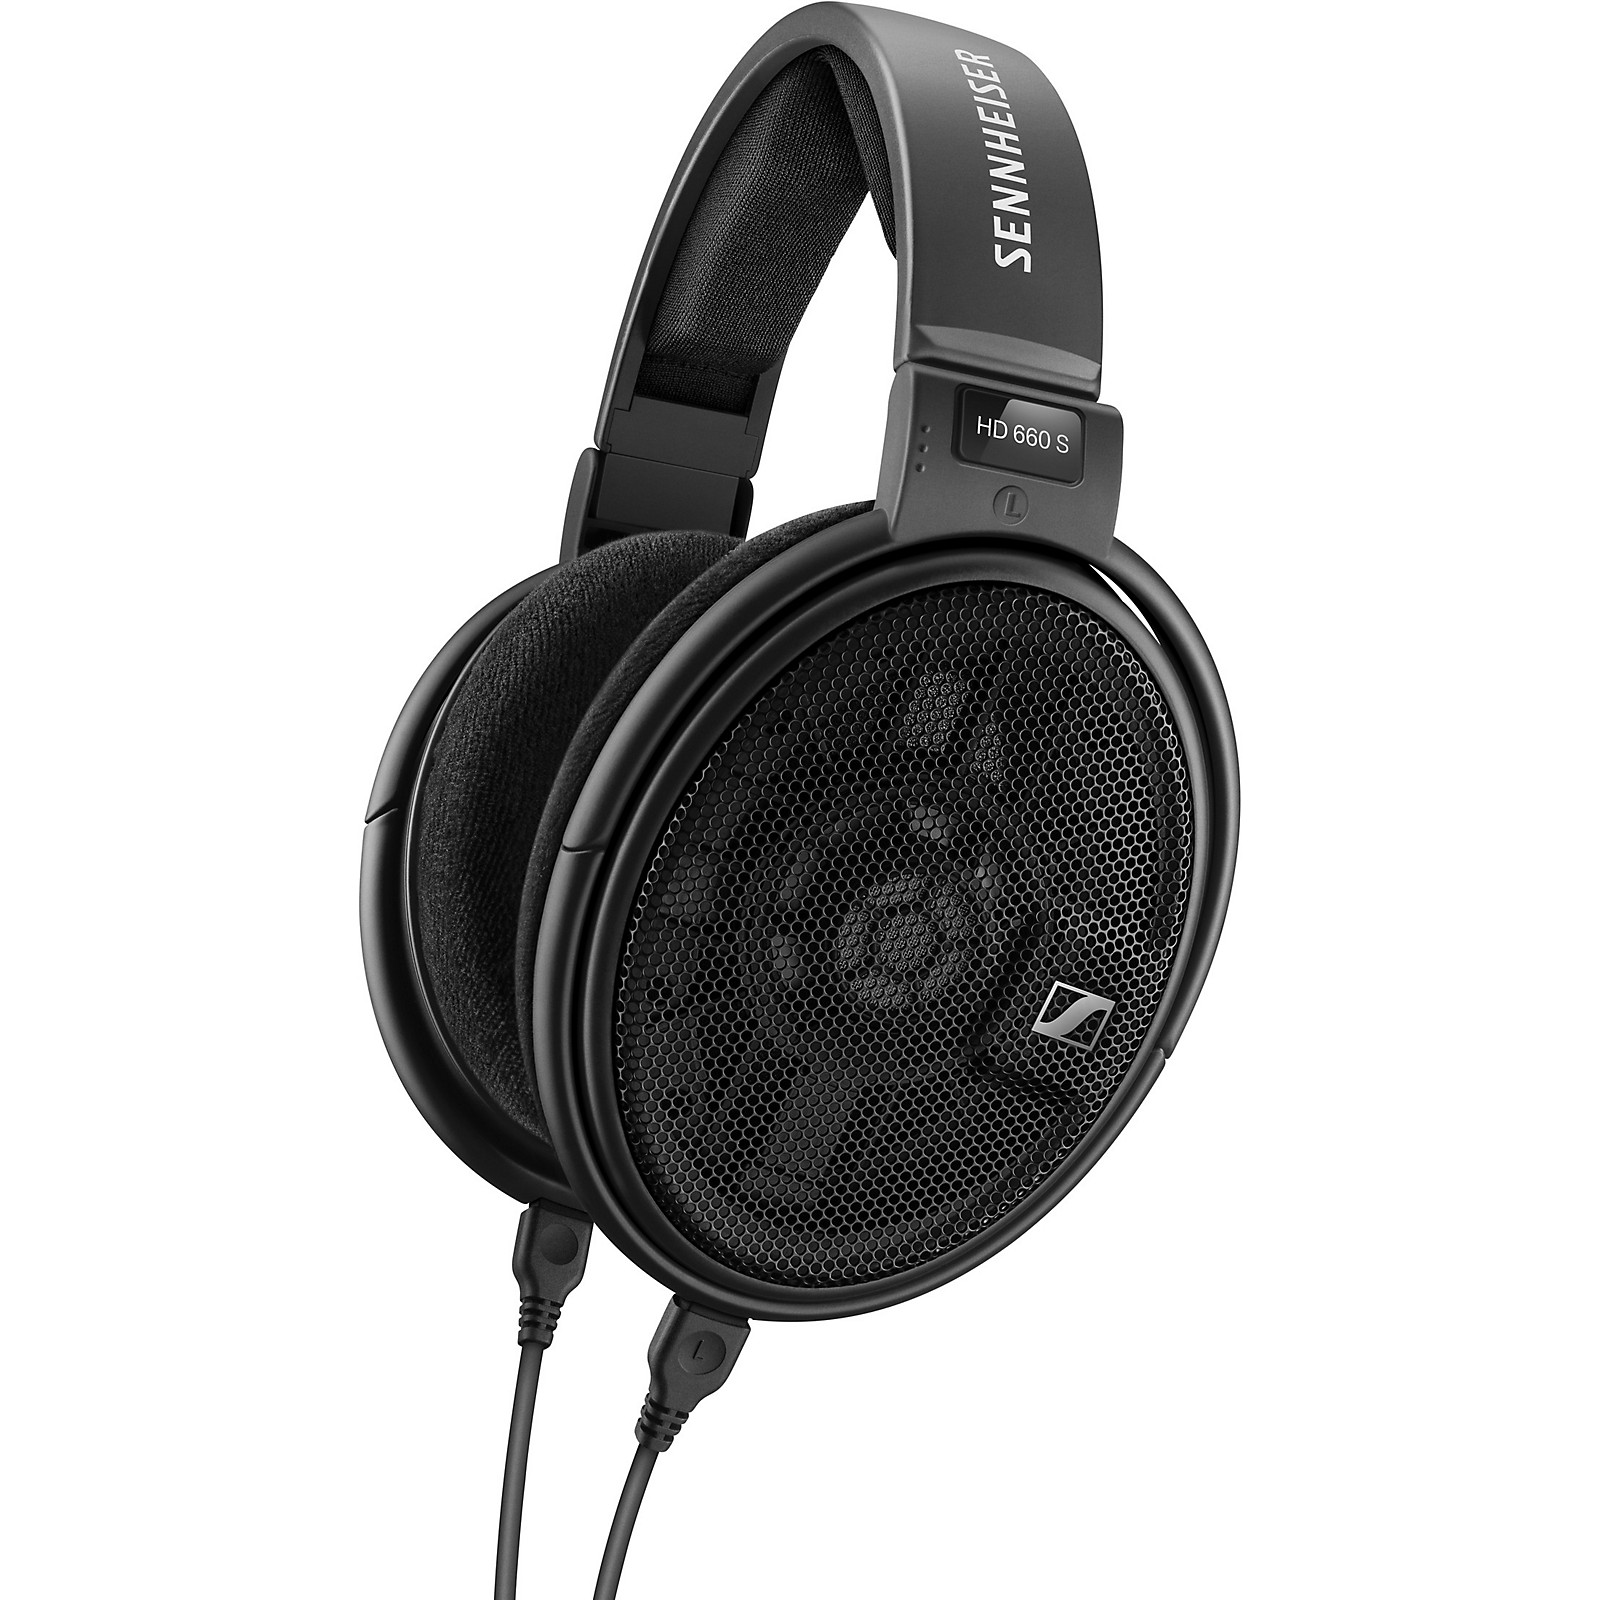 Open Box Sennheiser HD 660 S Binaural Recording Headset